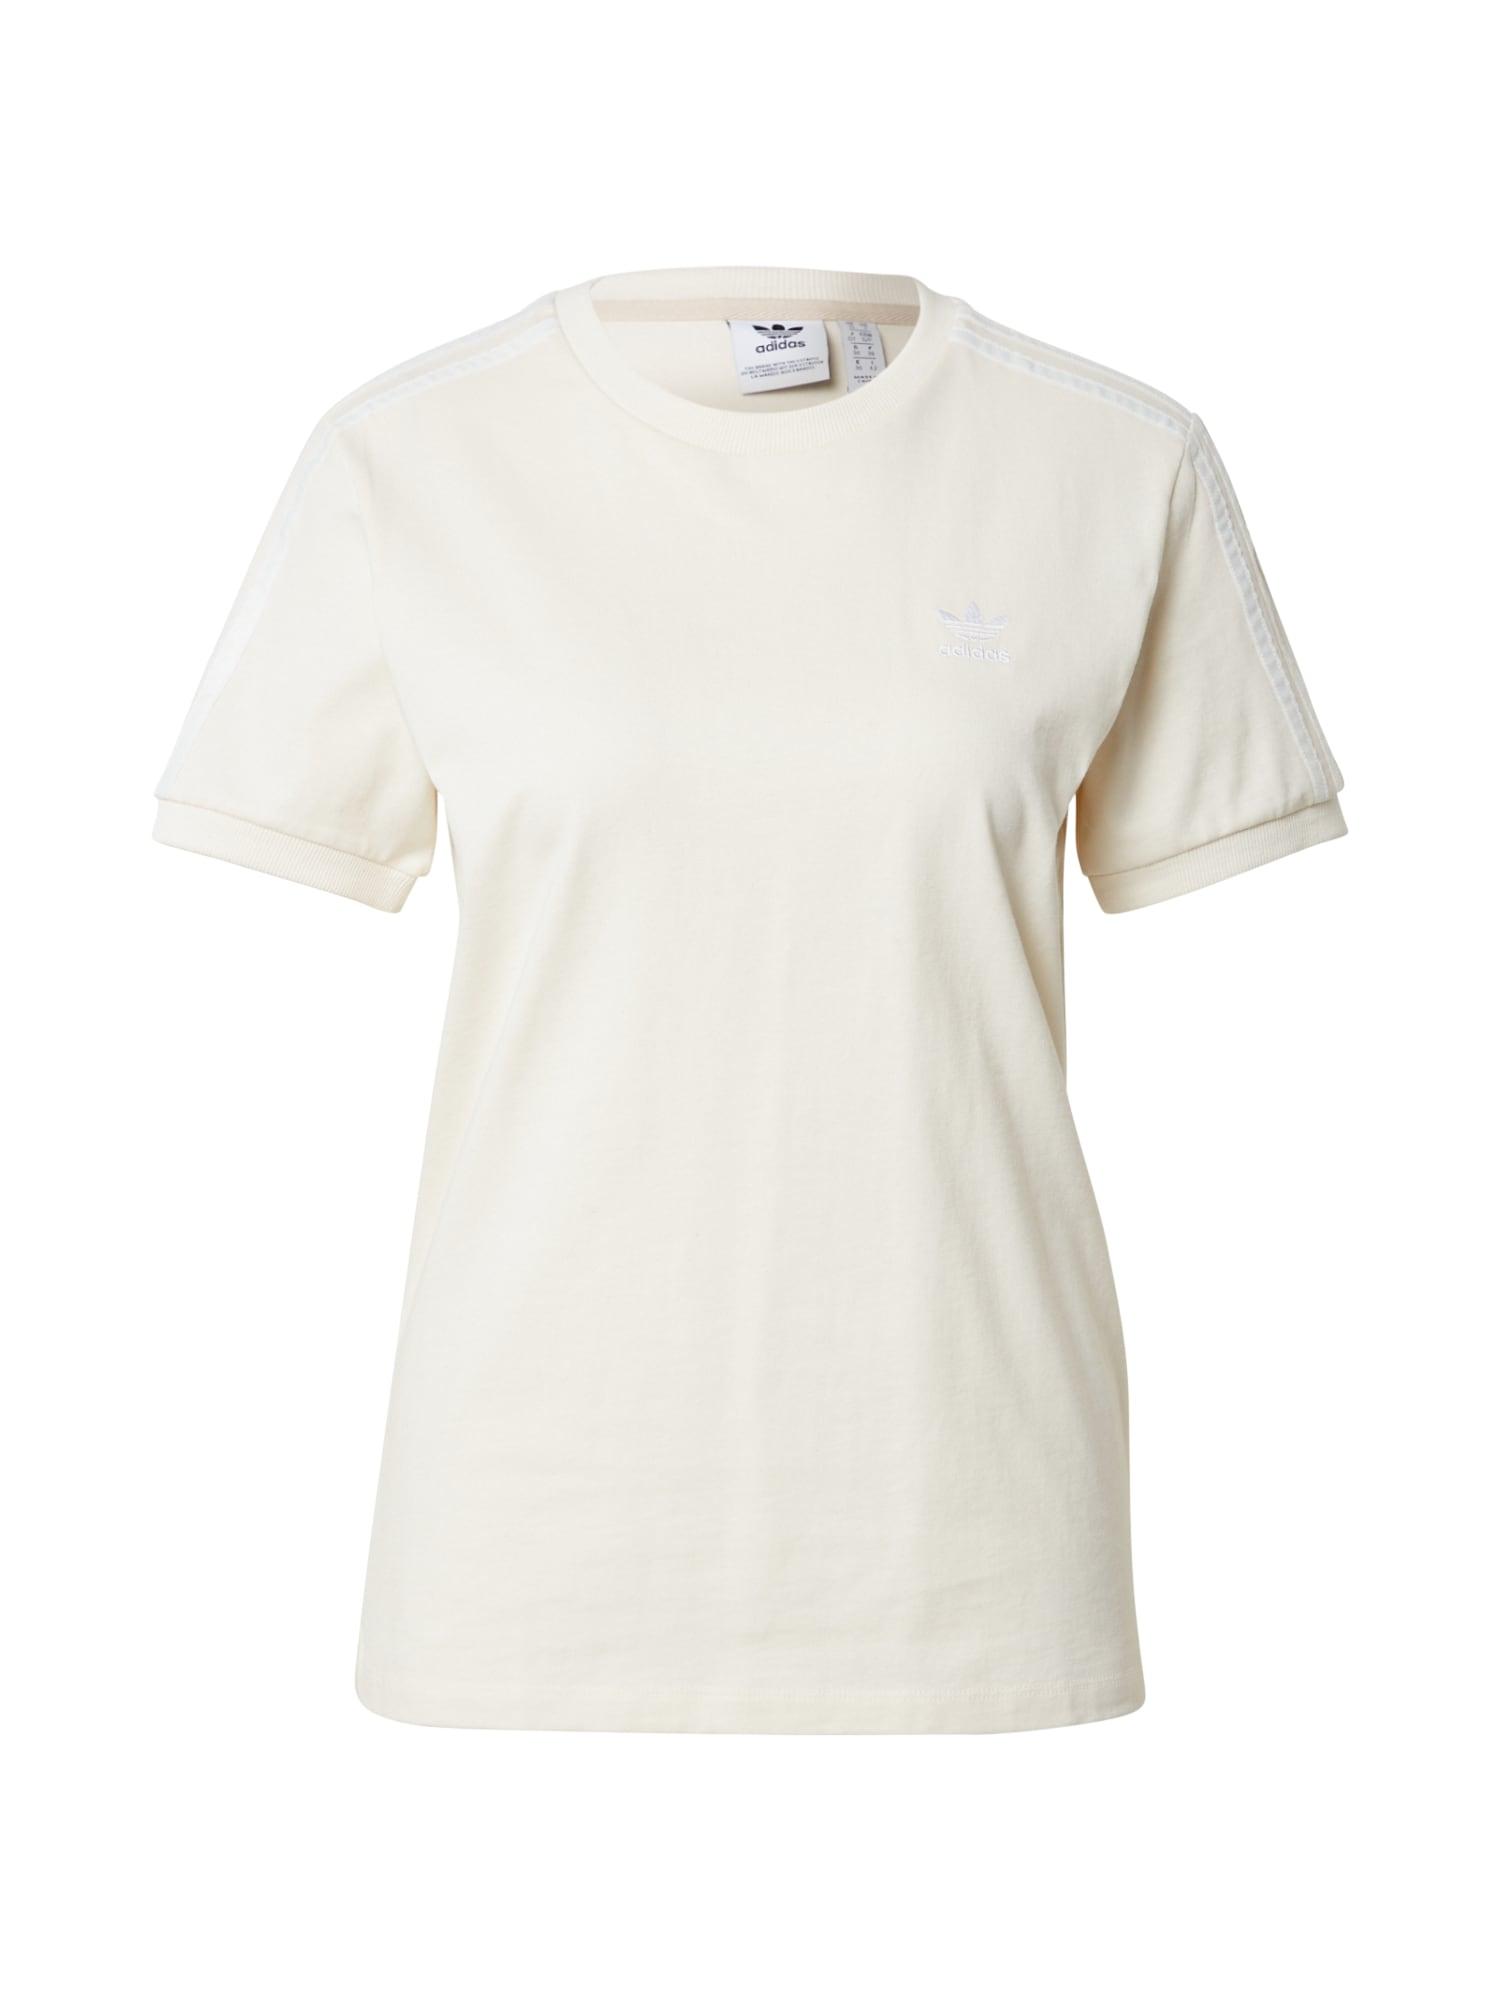 ADIDAS ORIGINALS Marškinėliai natūrali balta / balta